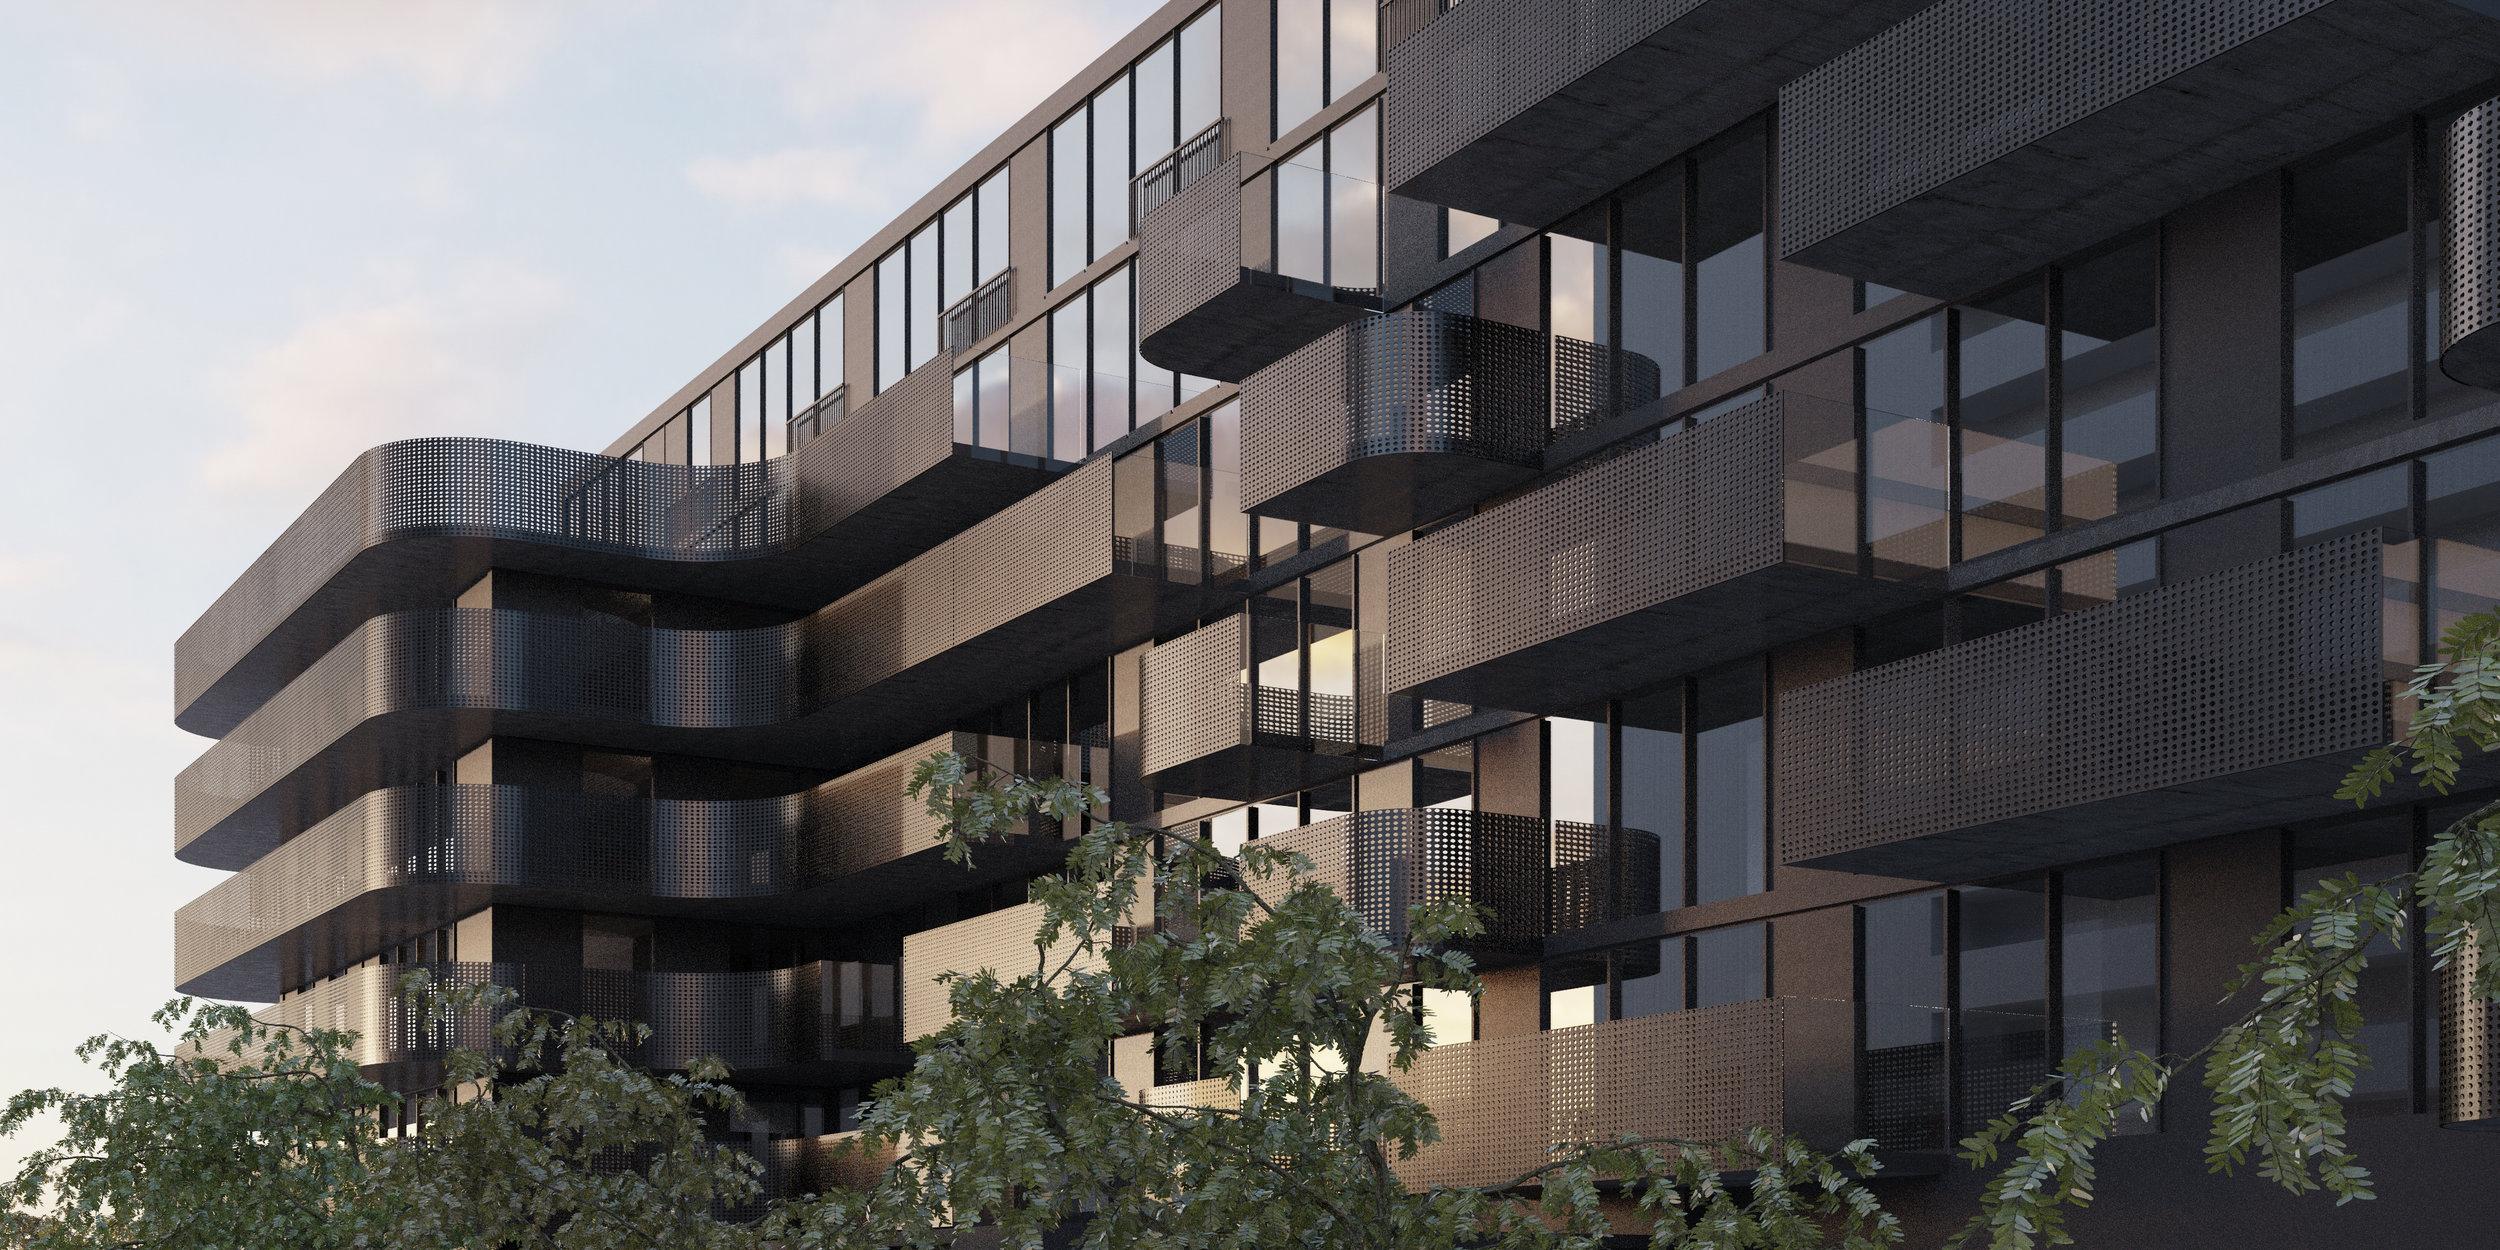 Tippett Black - Balconies